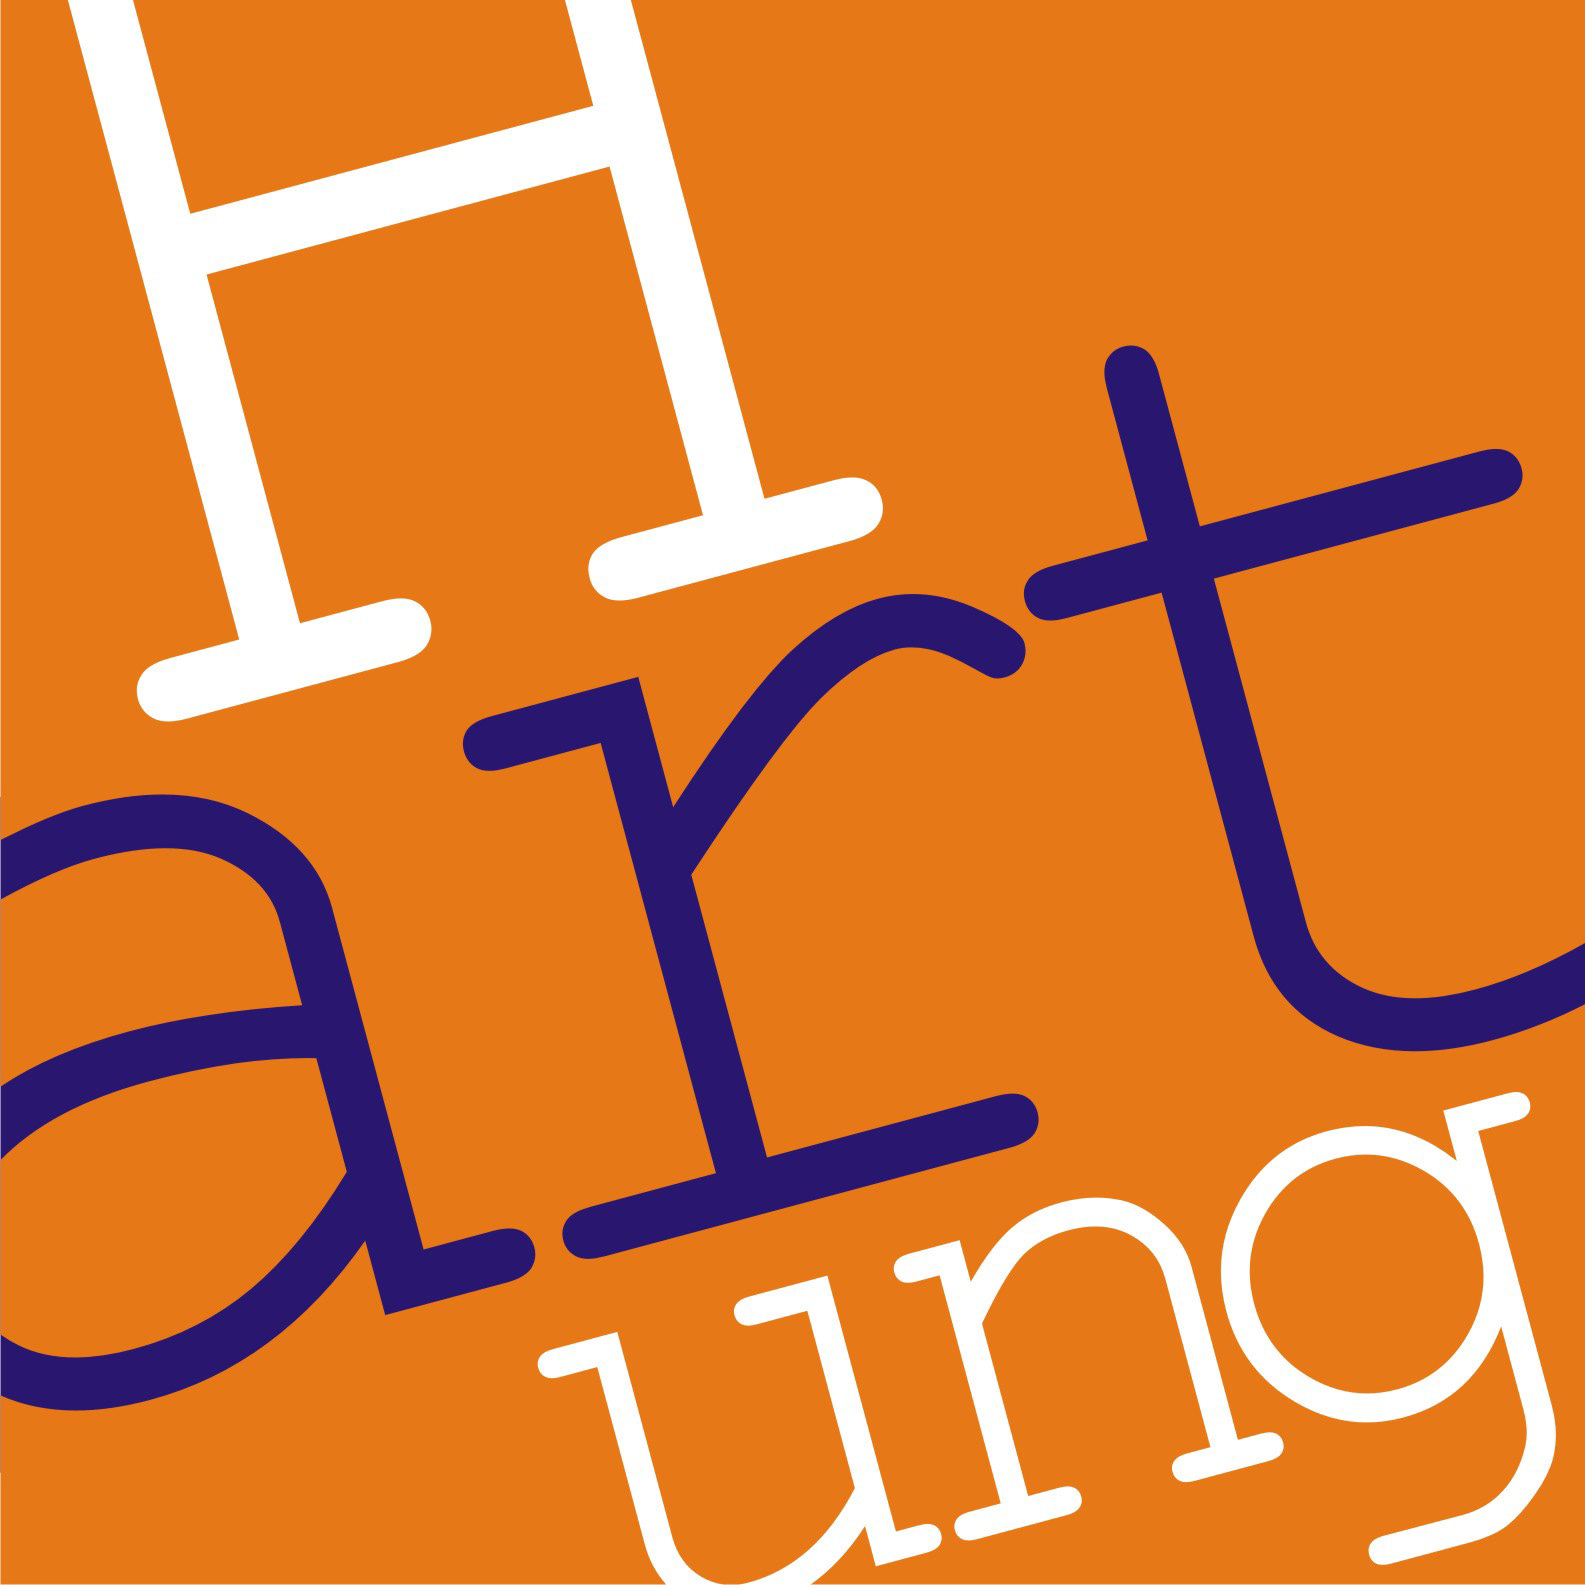 Martin Hartung